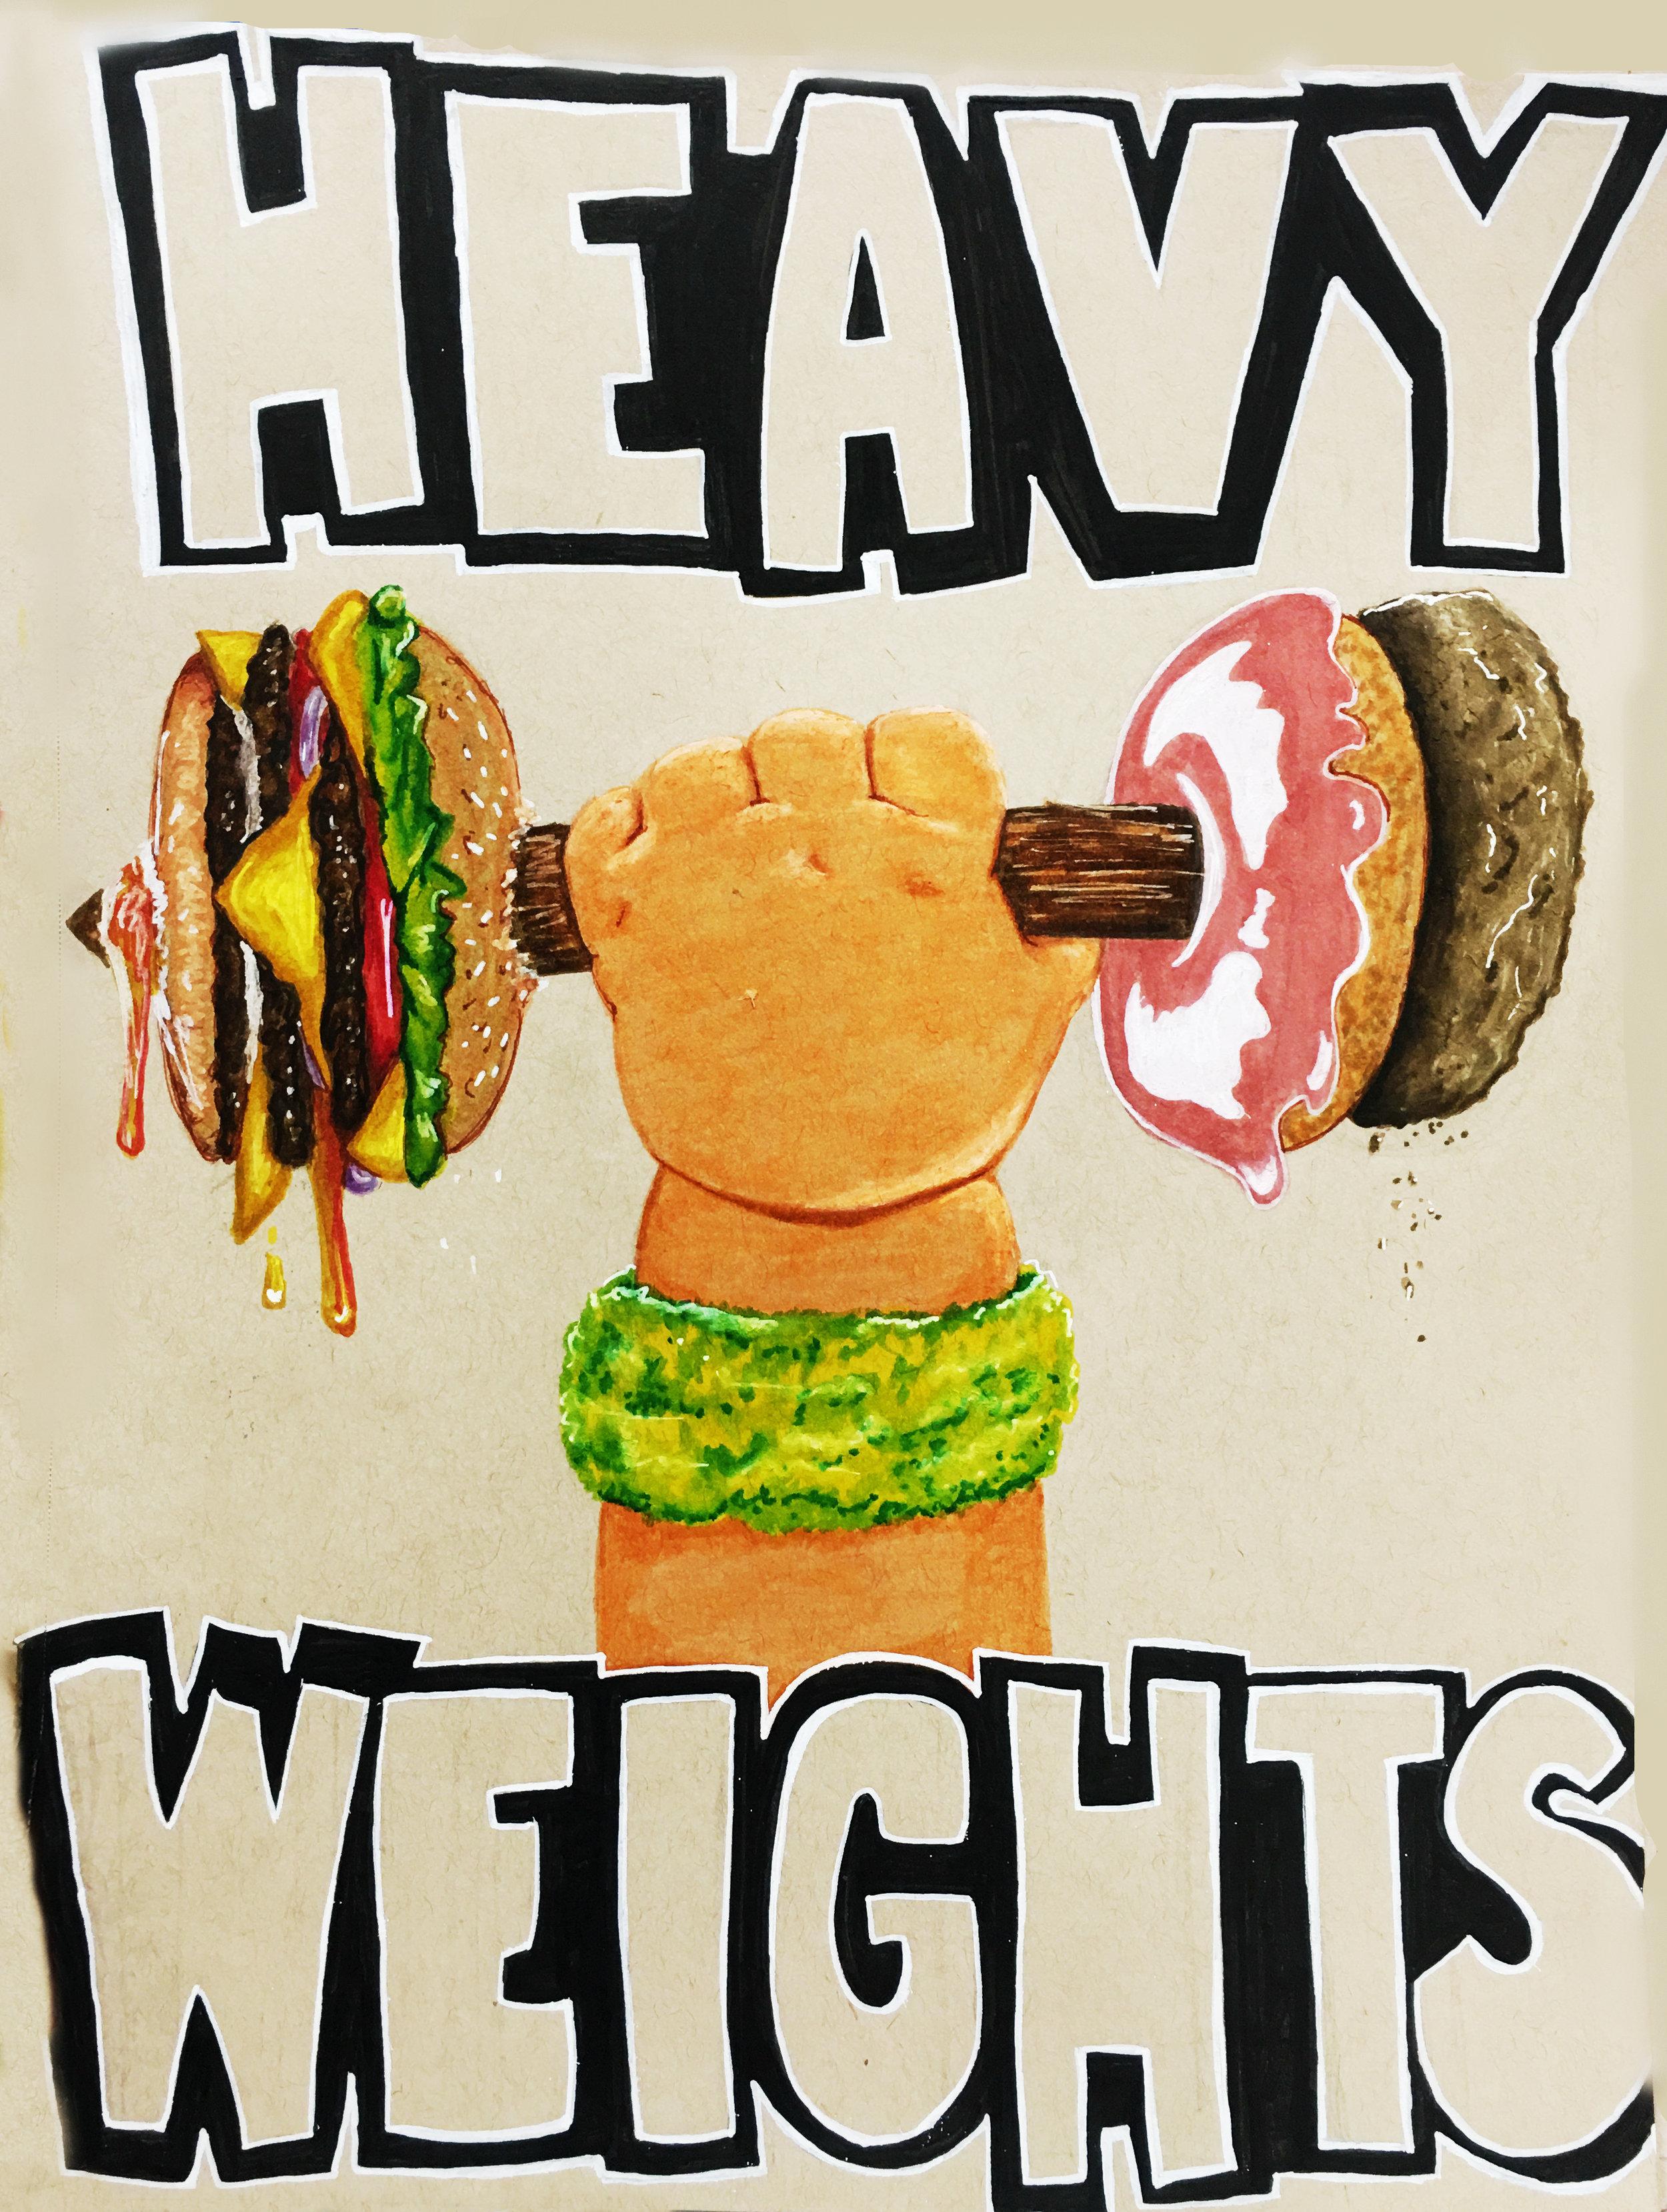 2017: Heavy Weights